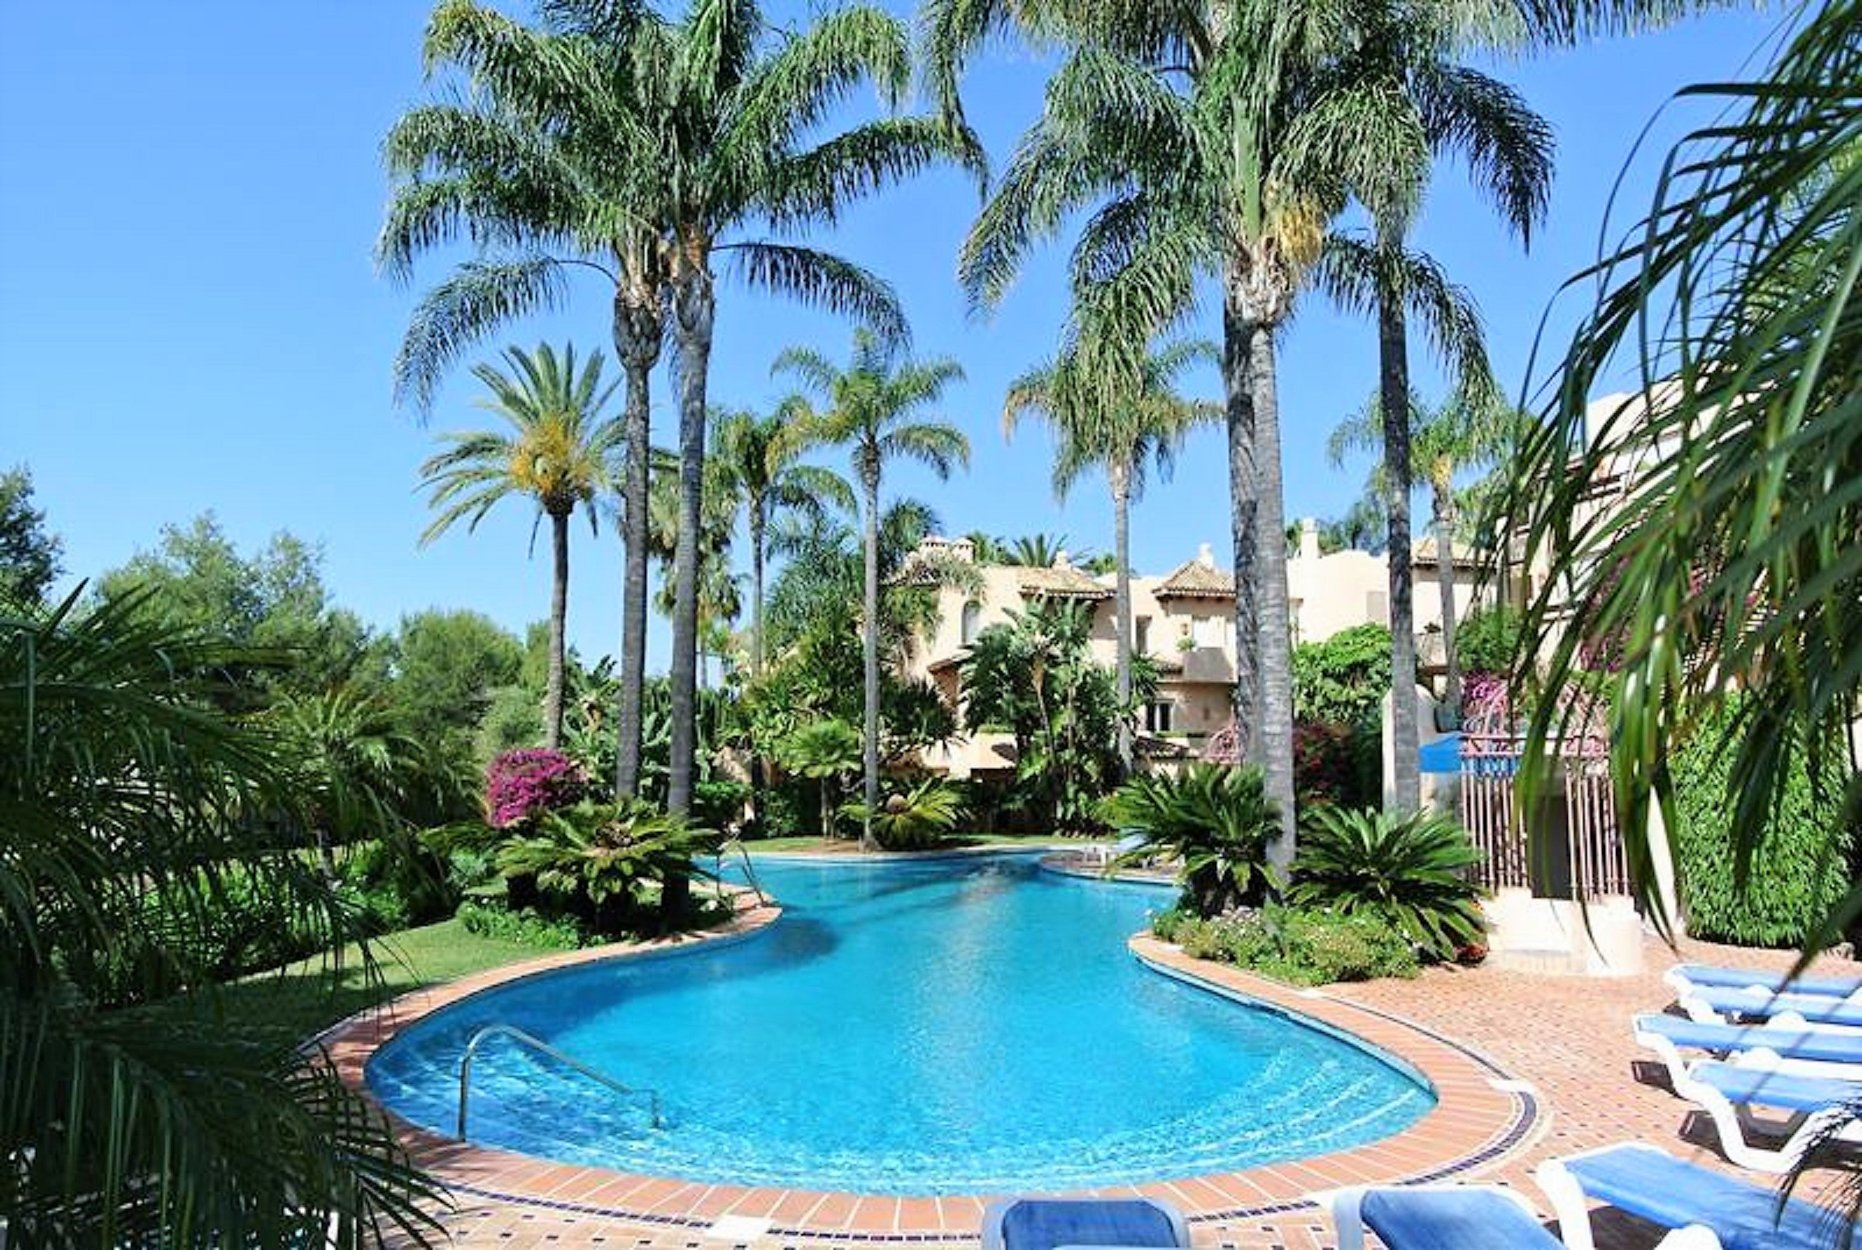 Apartment for sale in Marbella, El Alfar